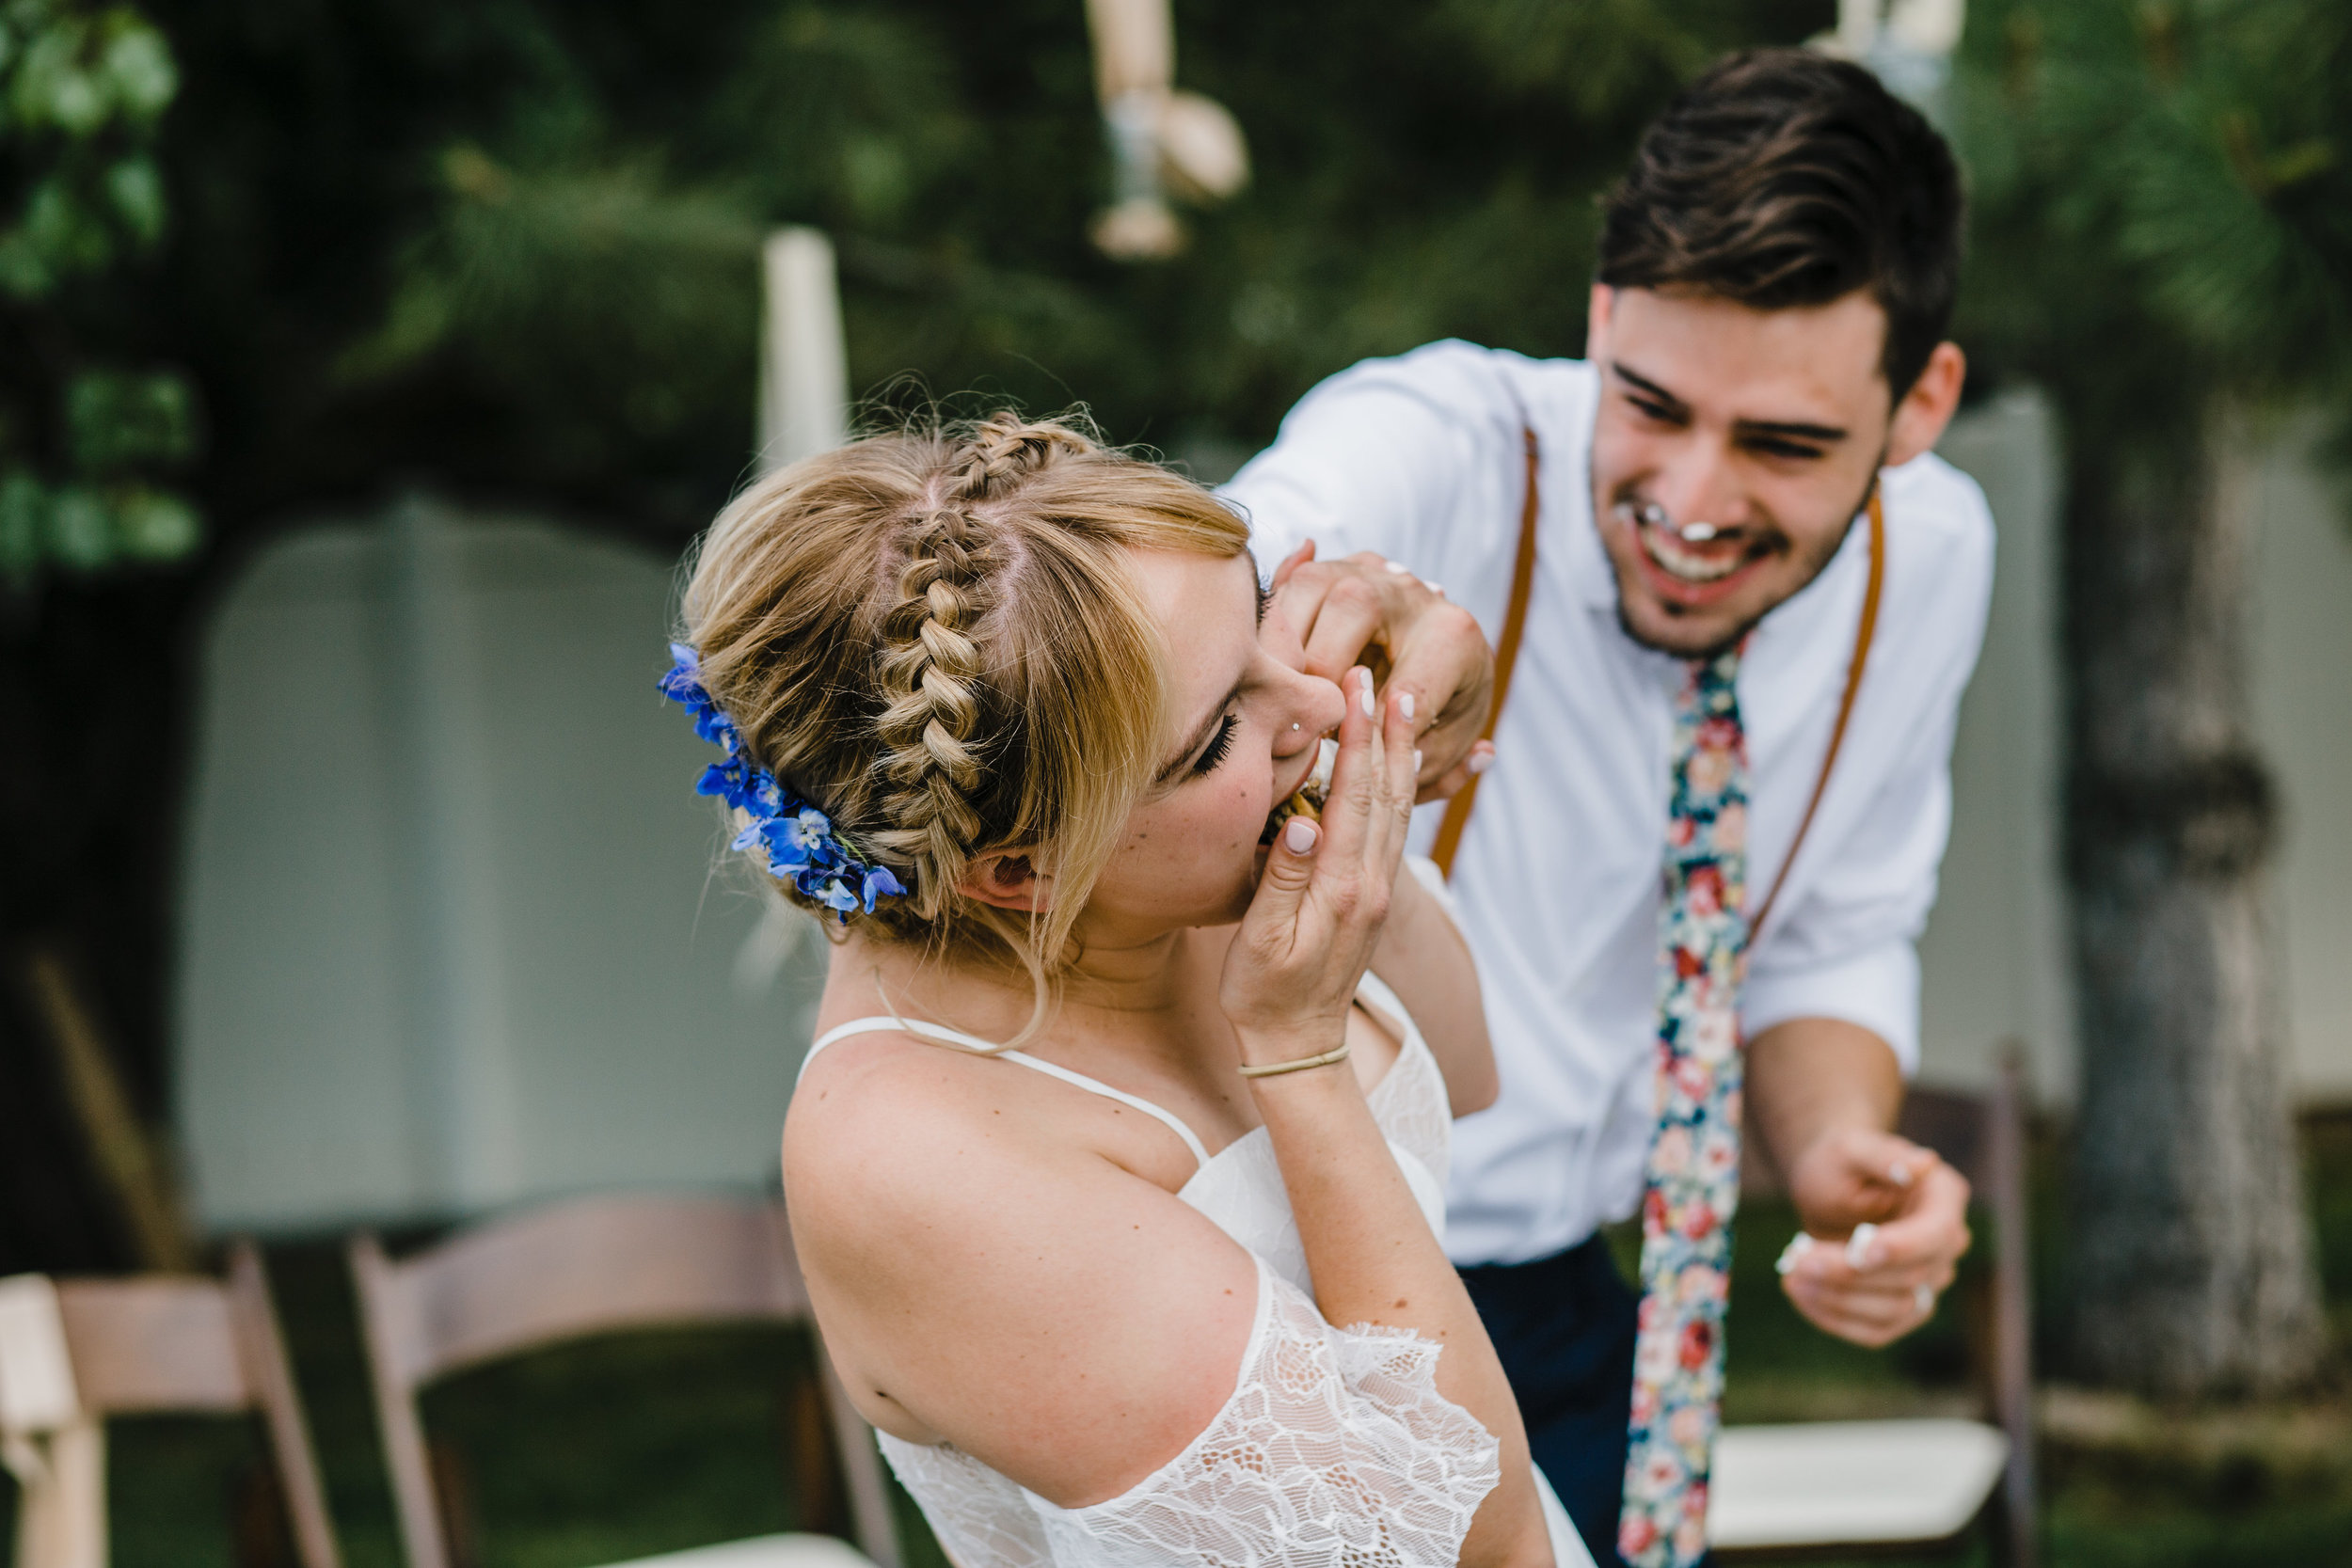 South jordan utah wedding photographer outdoor wedding reception bohemian bride braided wedding hair blue flower crown stuffing cake faces smiling